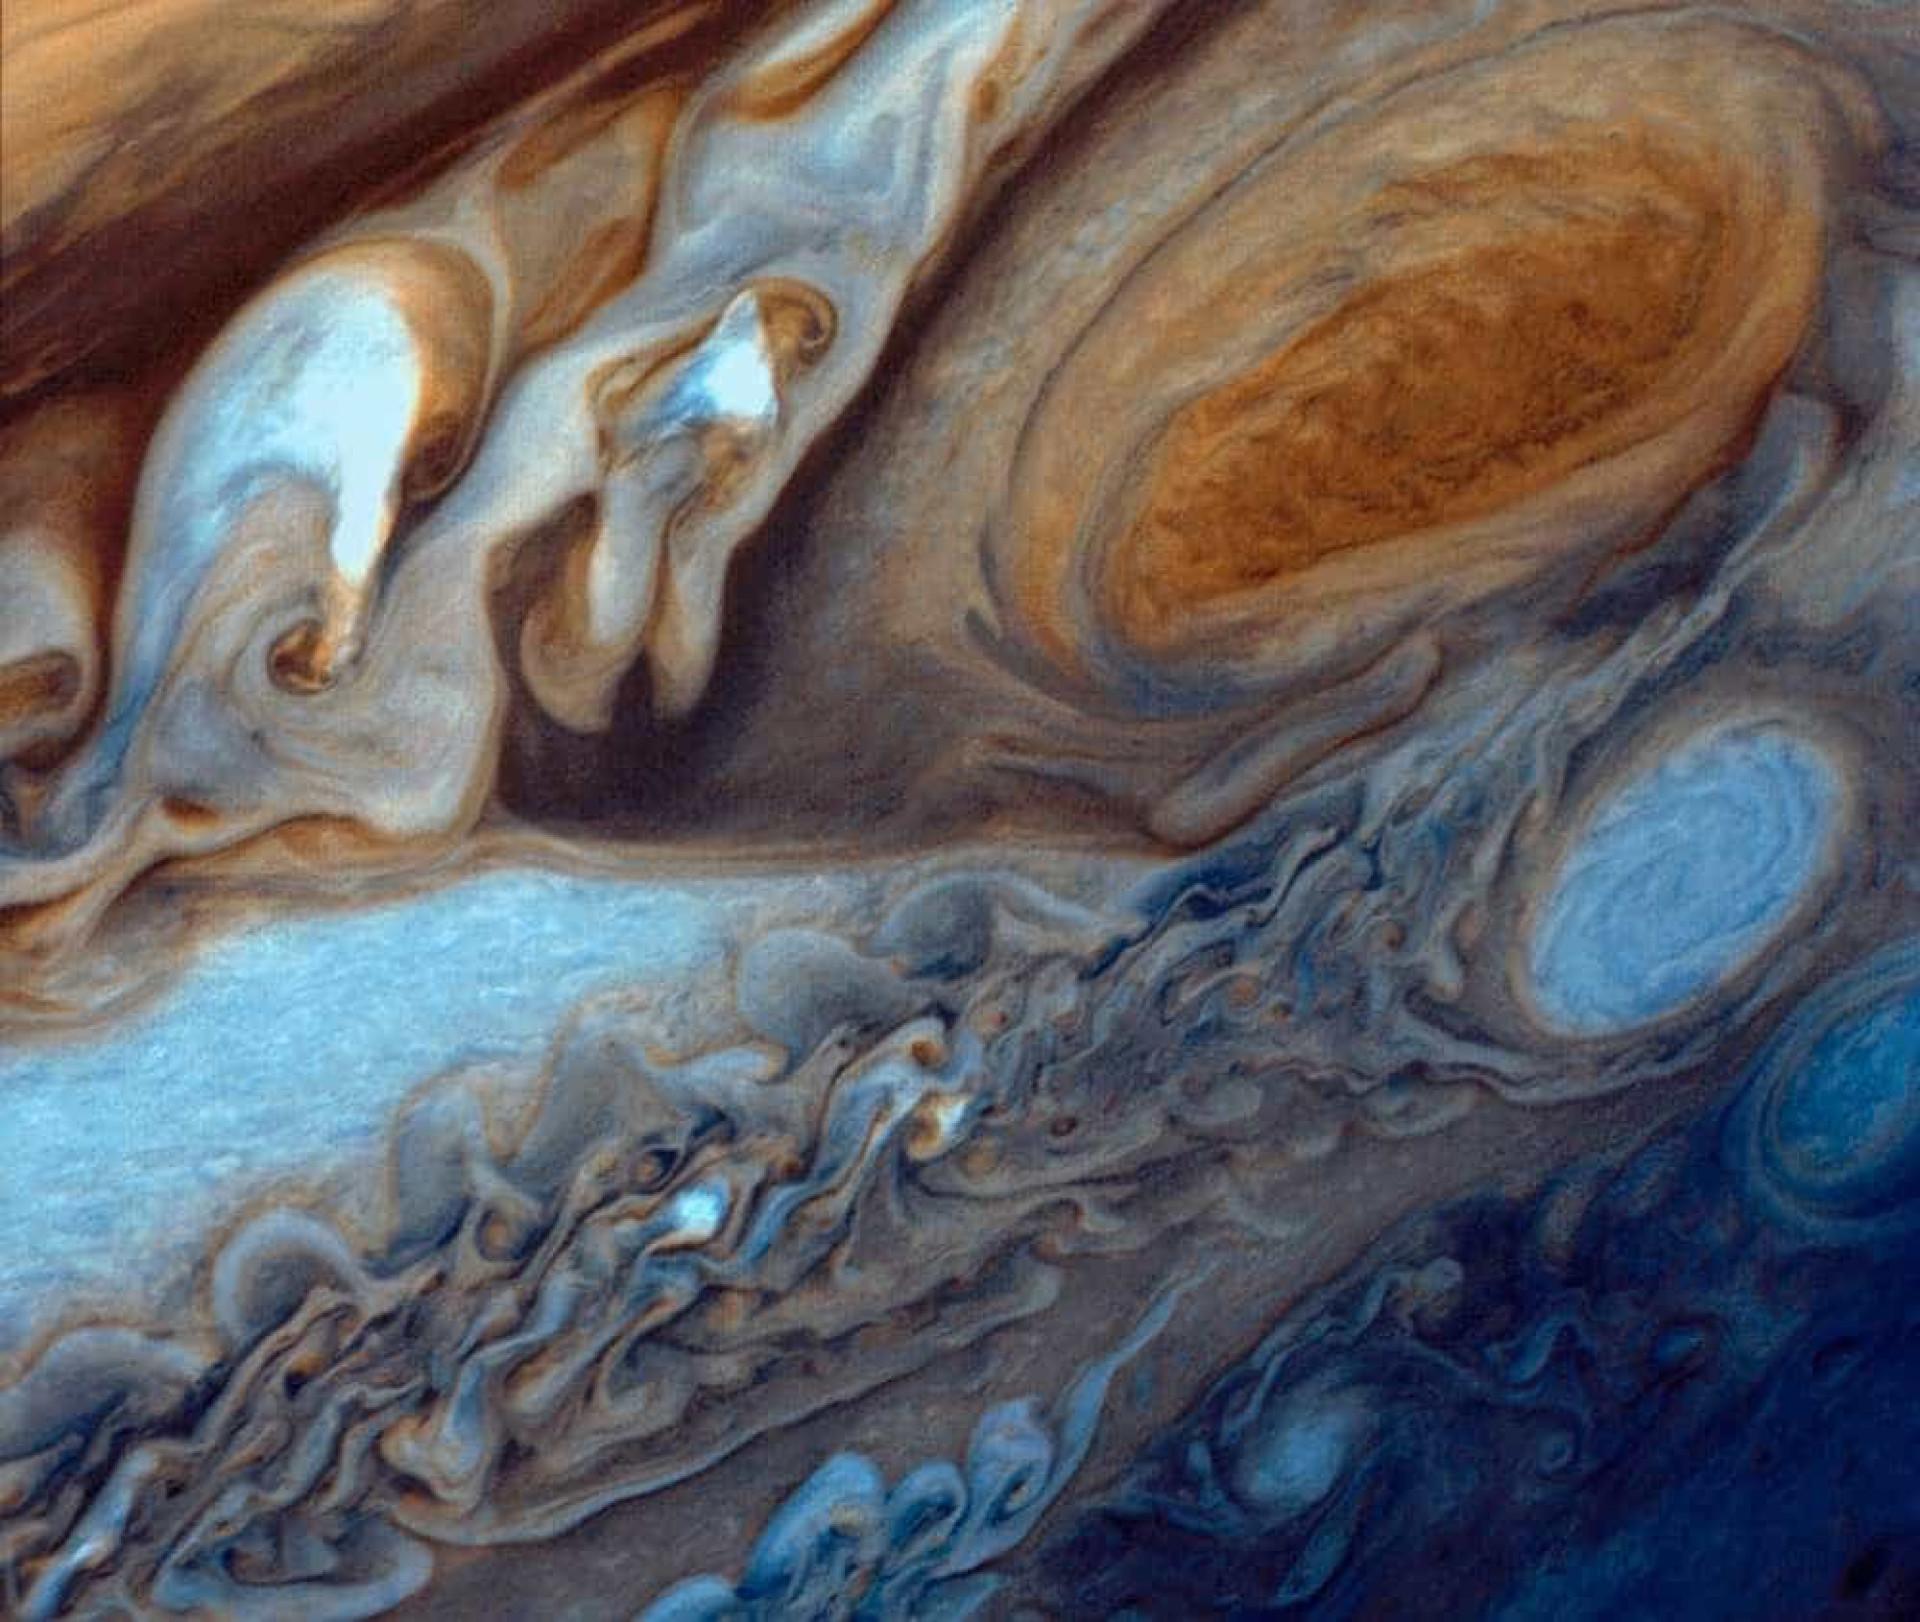 À descoberta de Júpiter através de imagens impressionantes